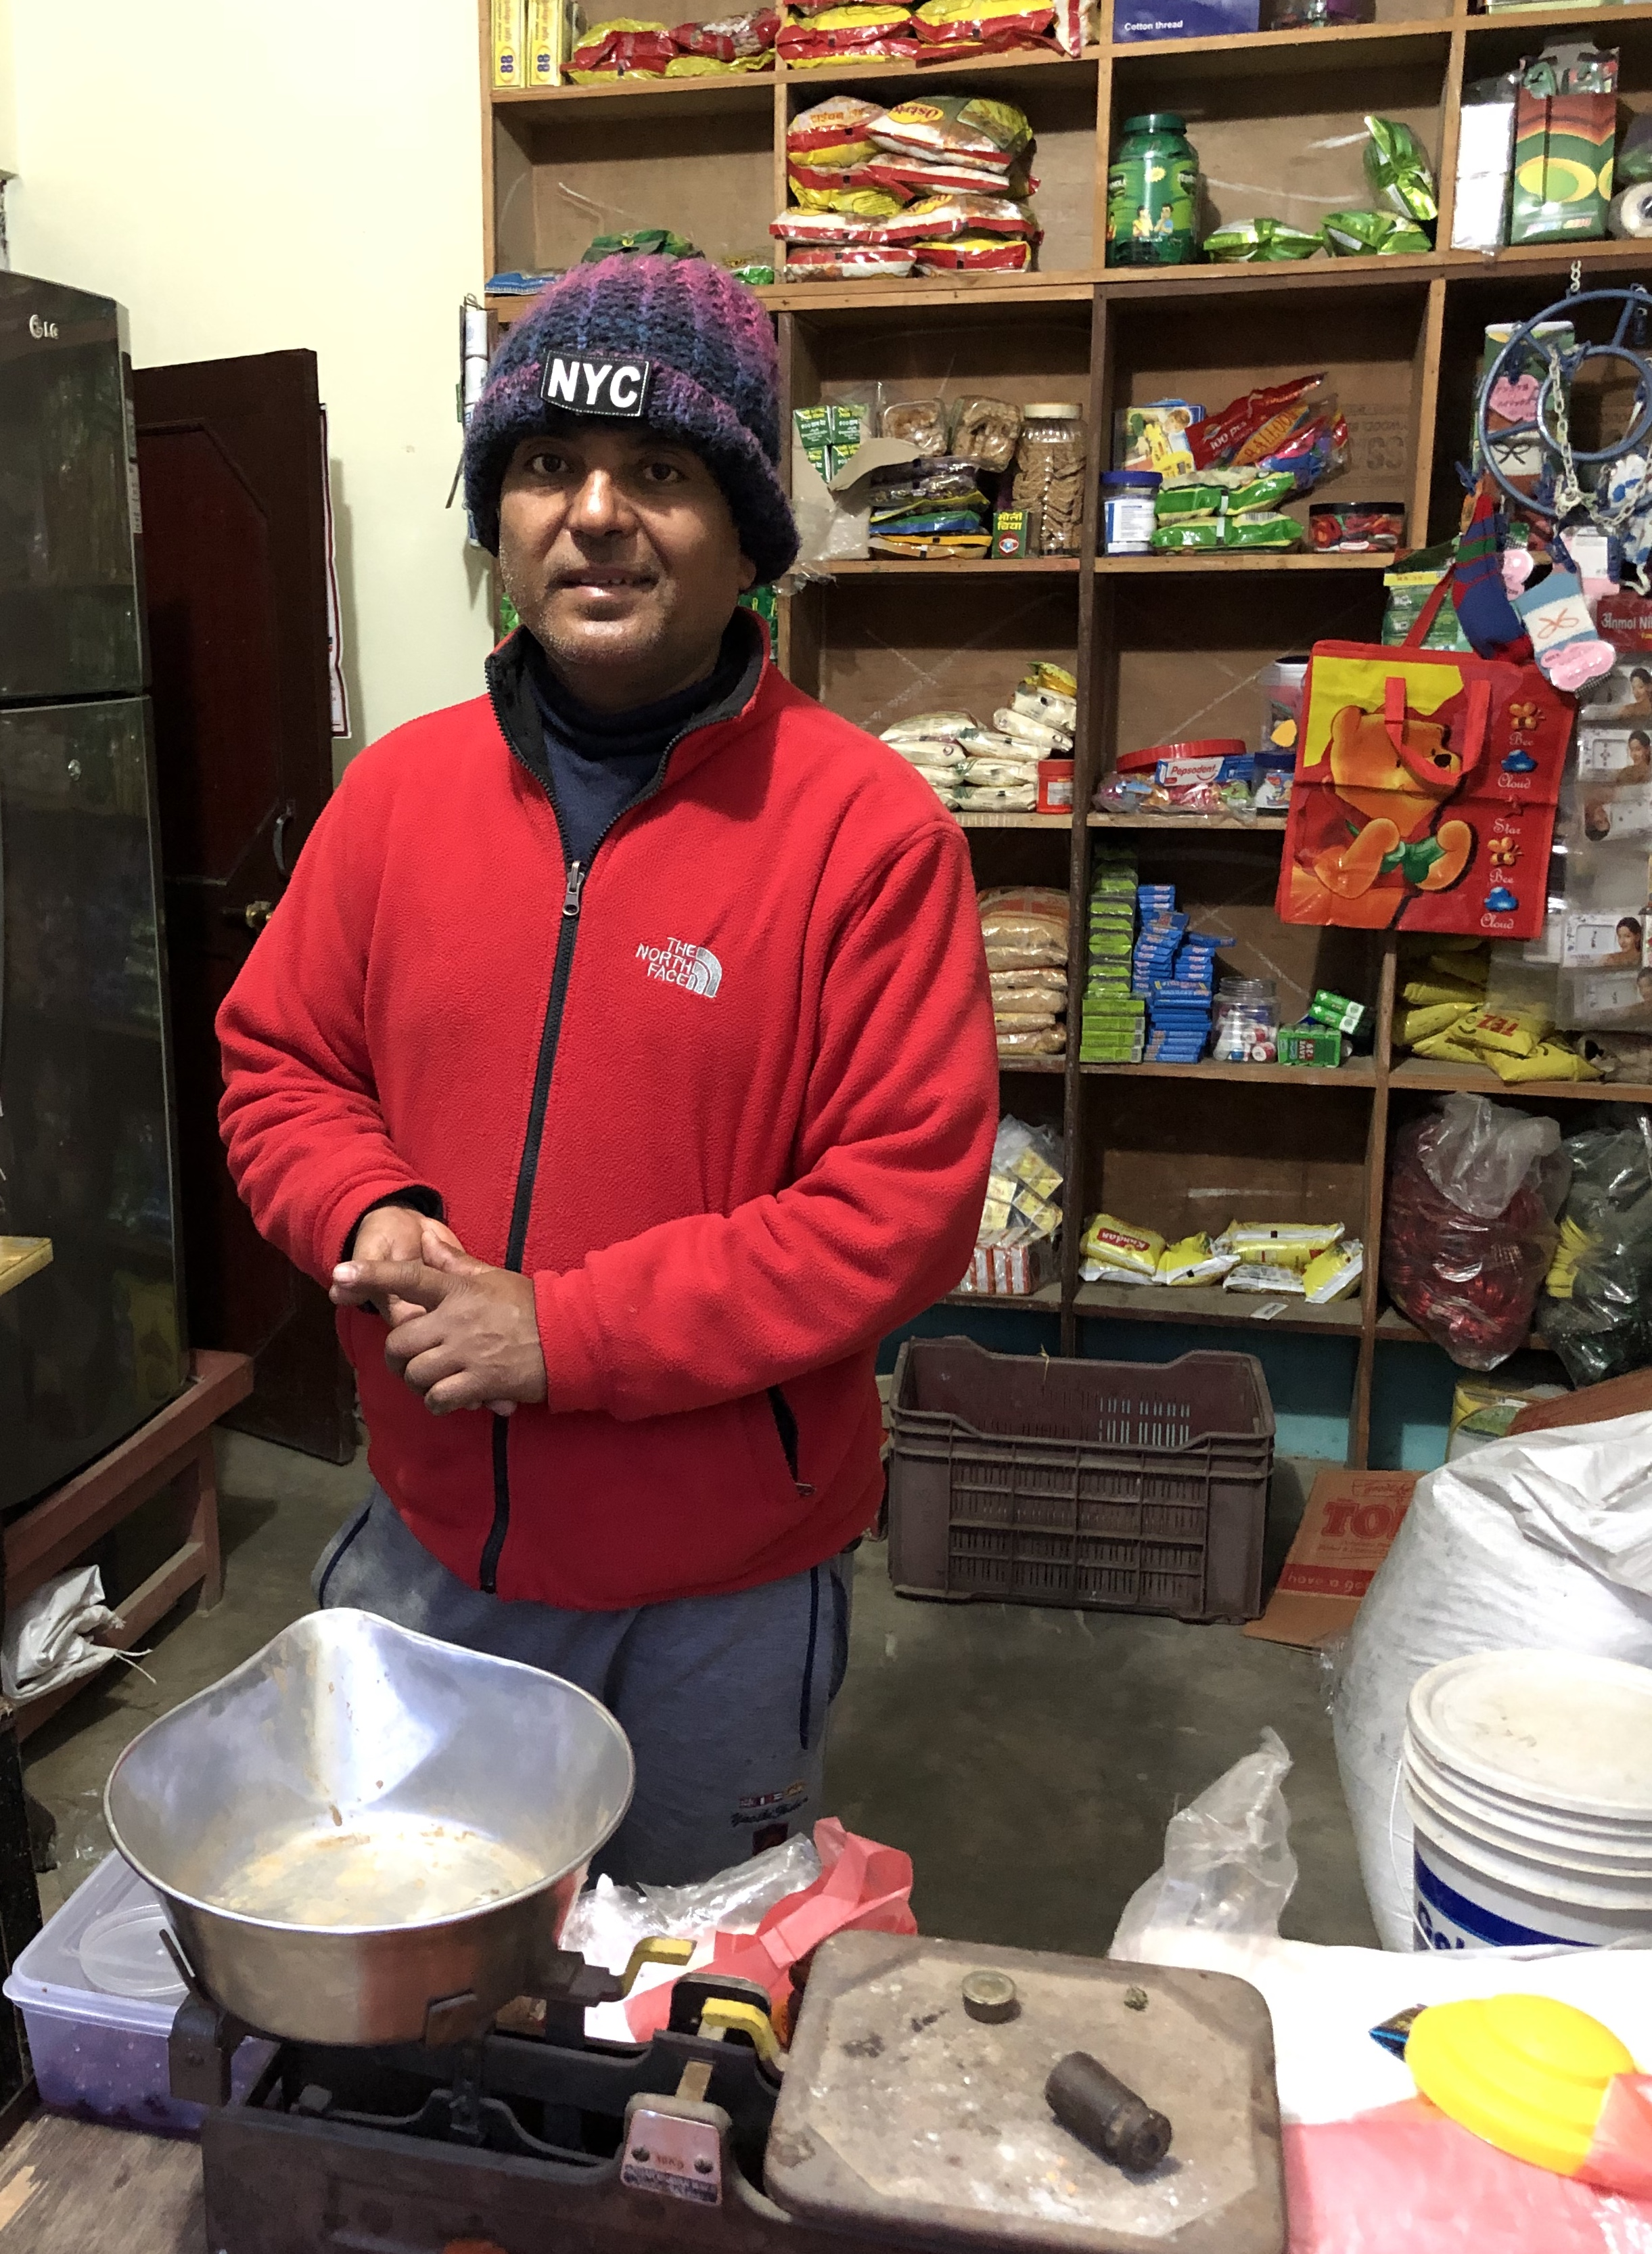 Dinesh in his shop Photo: Svanhild Gjeraker